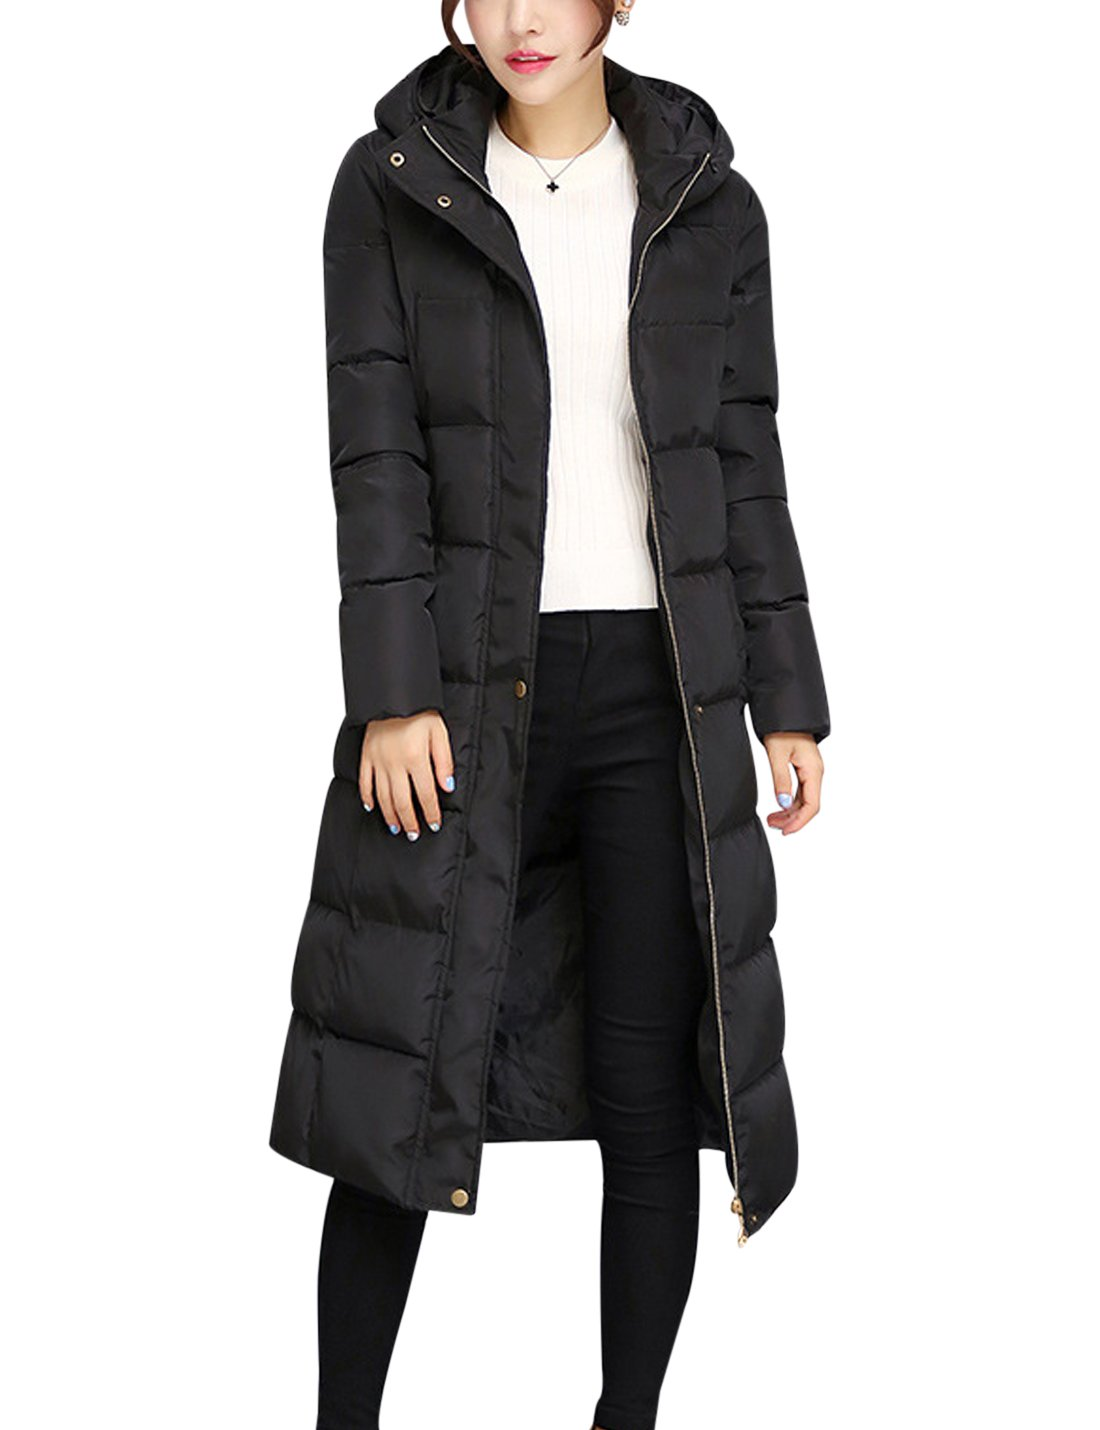 Tanming Women's Winter Cotton Padded Long Coat Outerwear With Fur Trim Hood (Large, Black) by Tanming (Image #3)